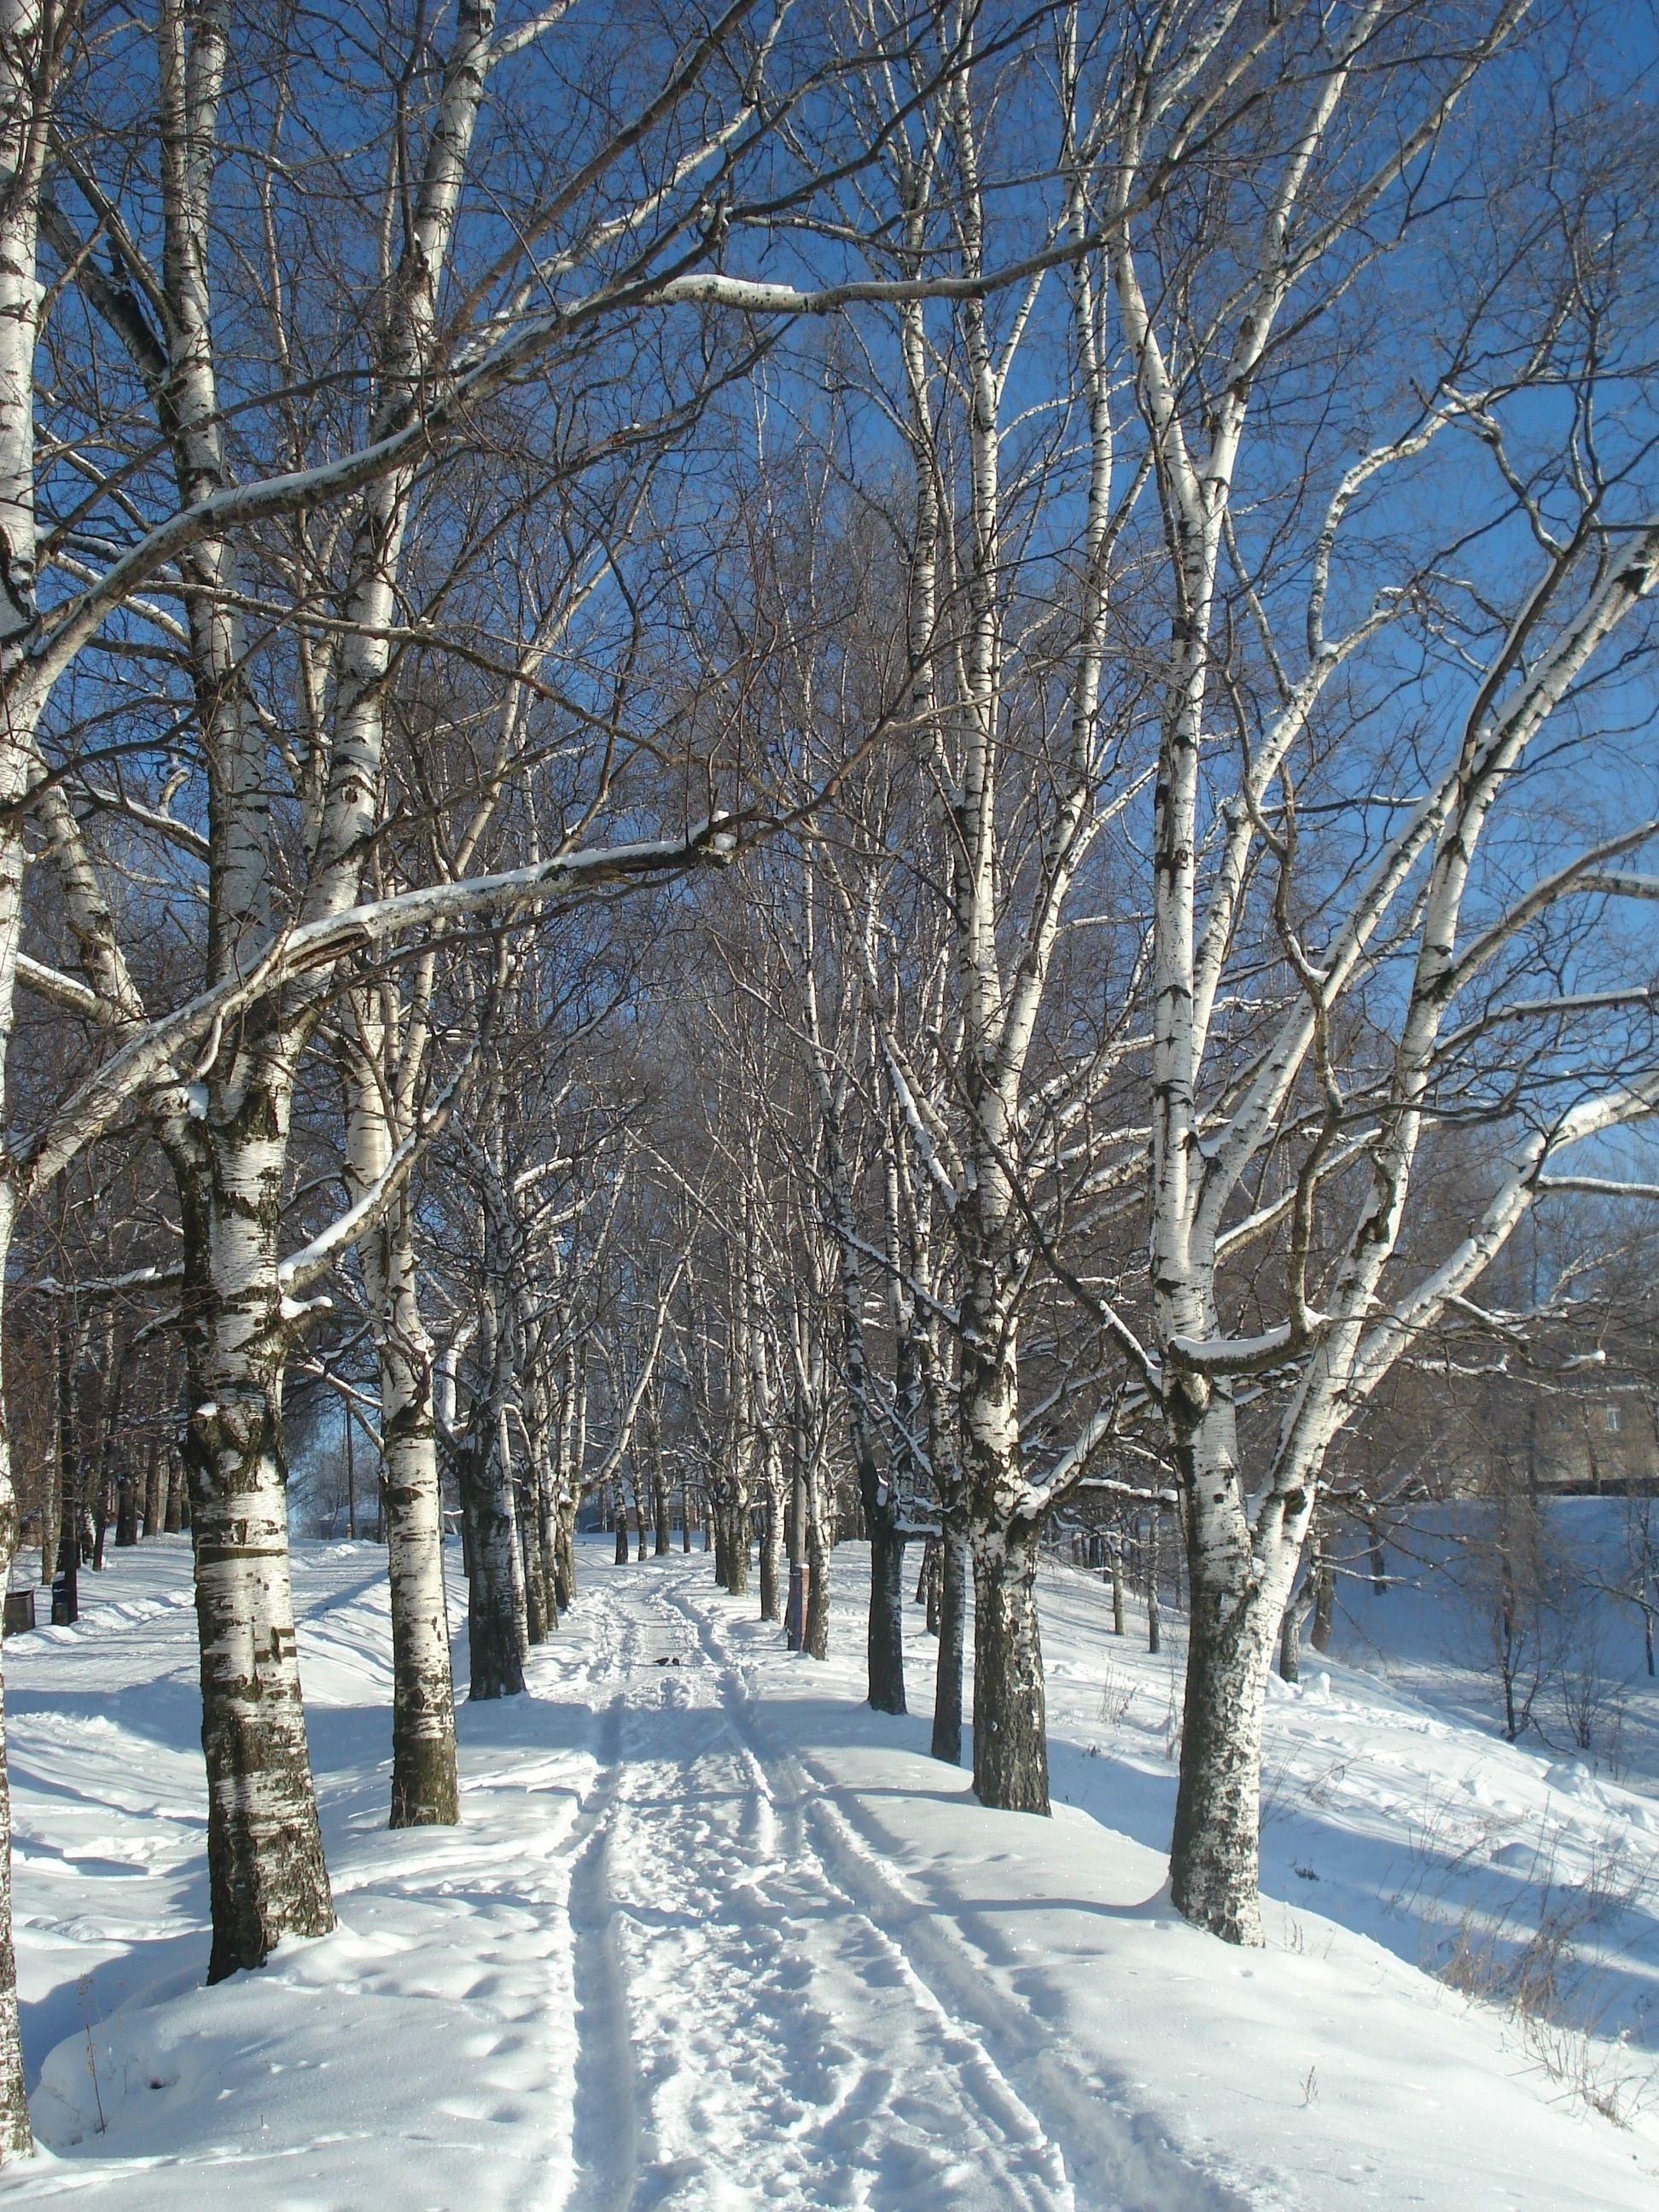 Path lined with birch trees, Yaroslavl, Russia